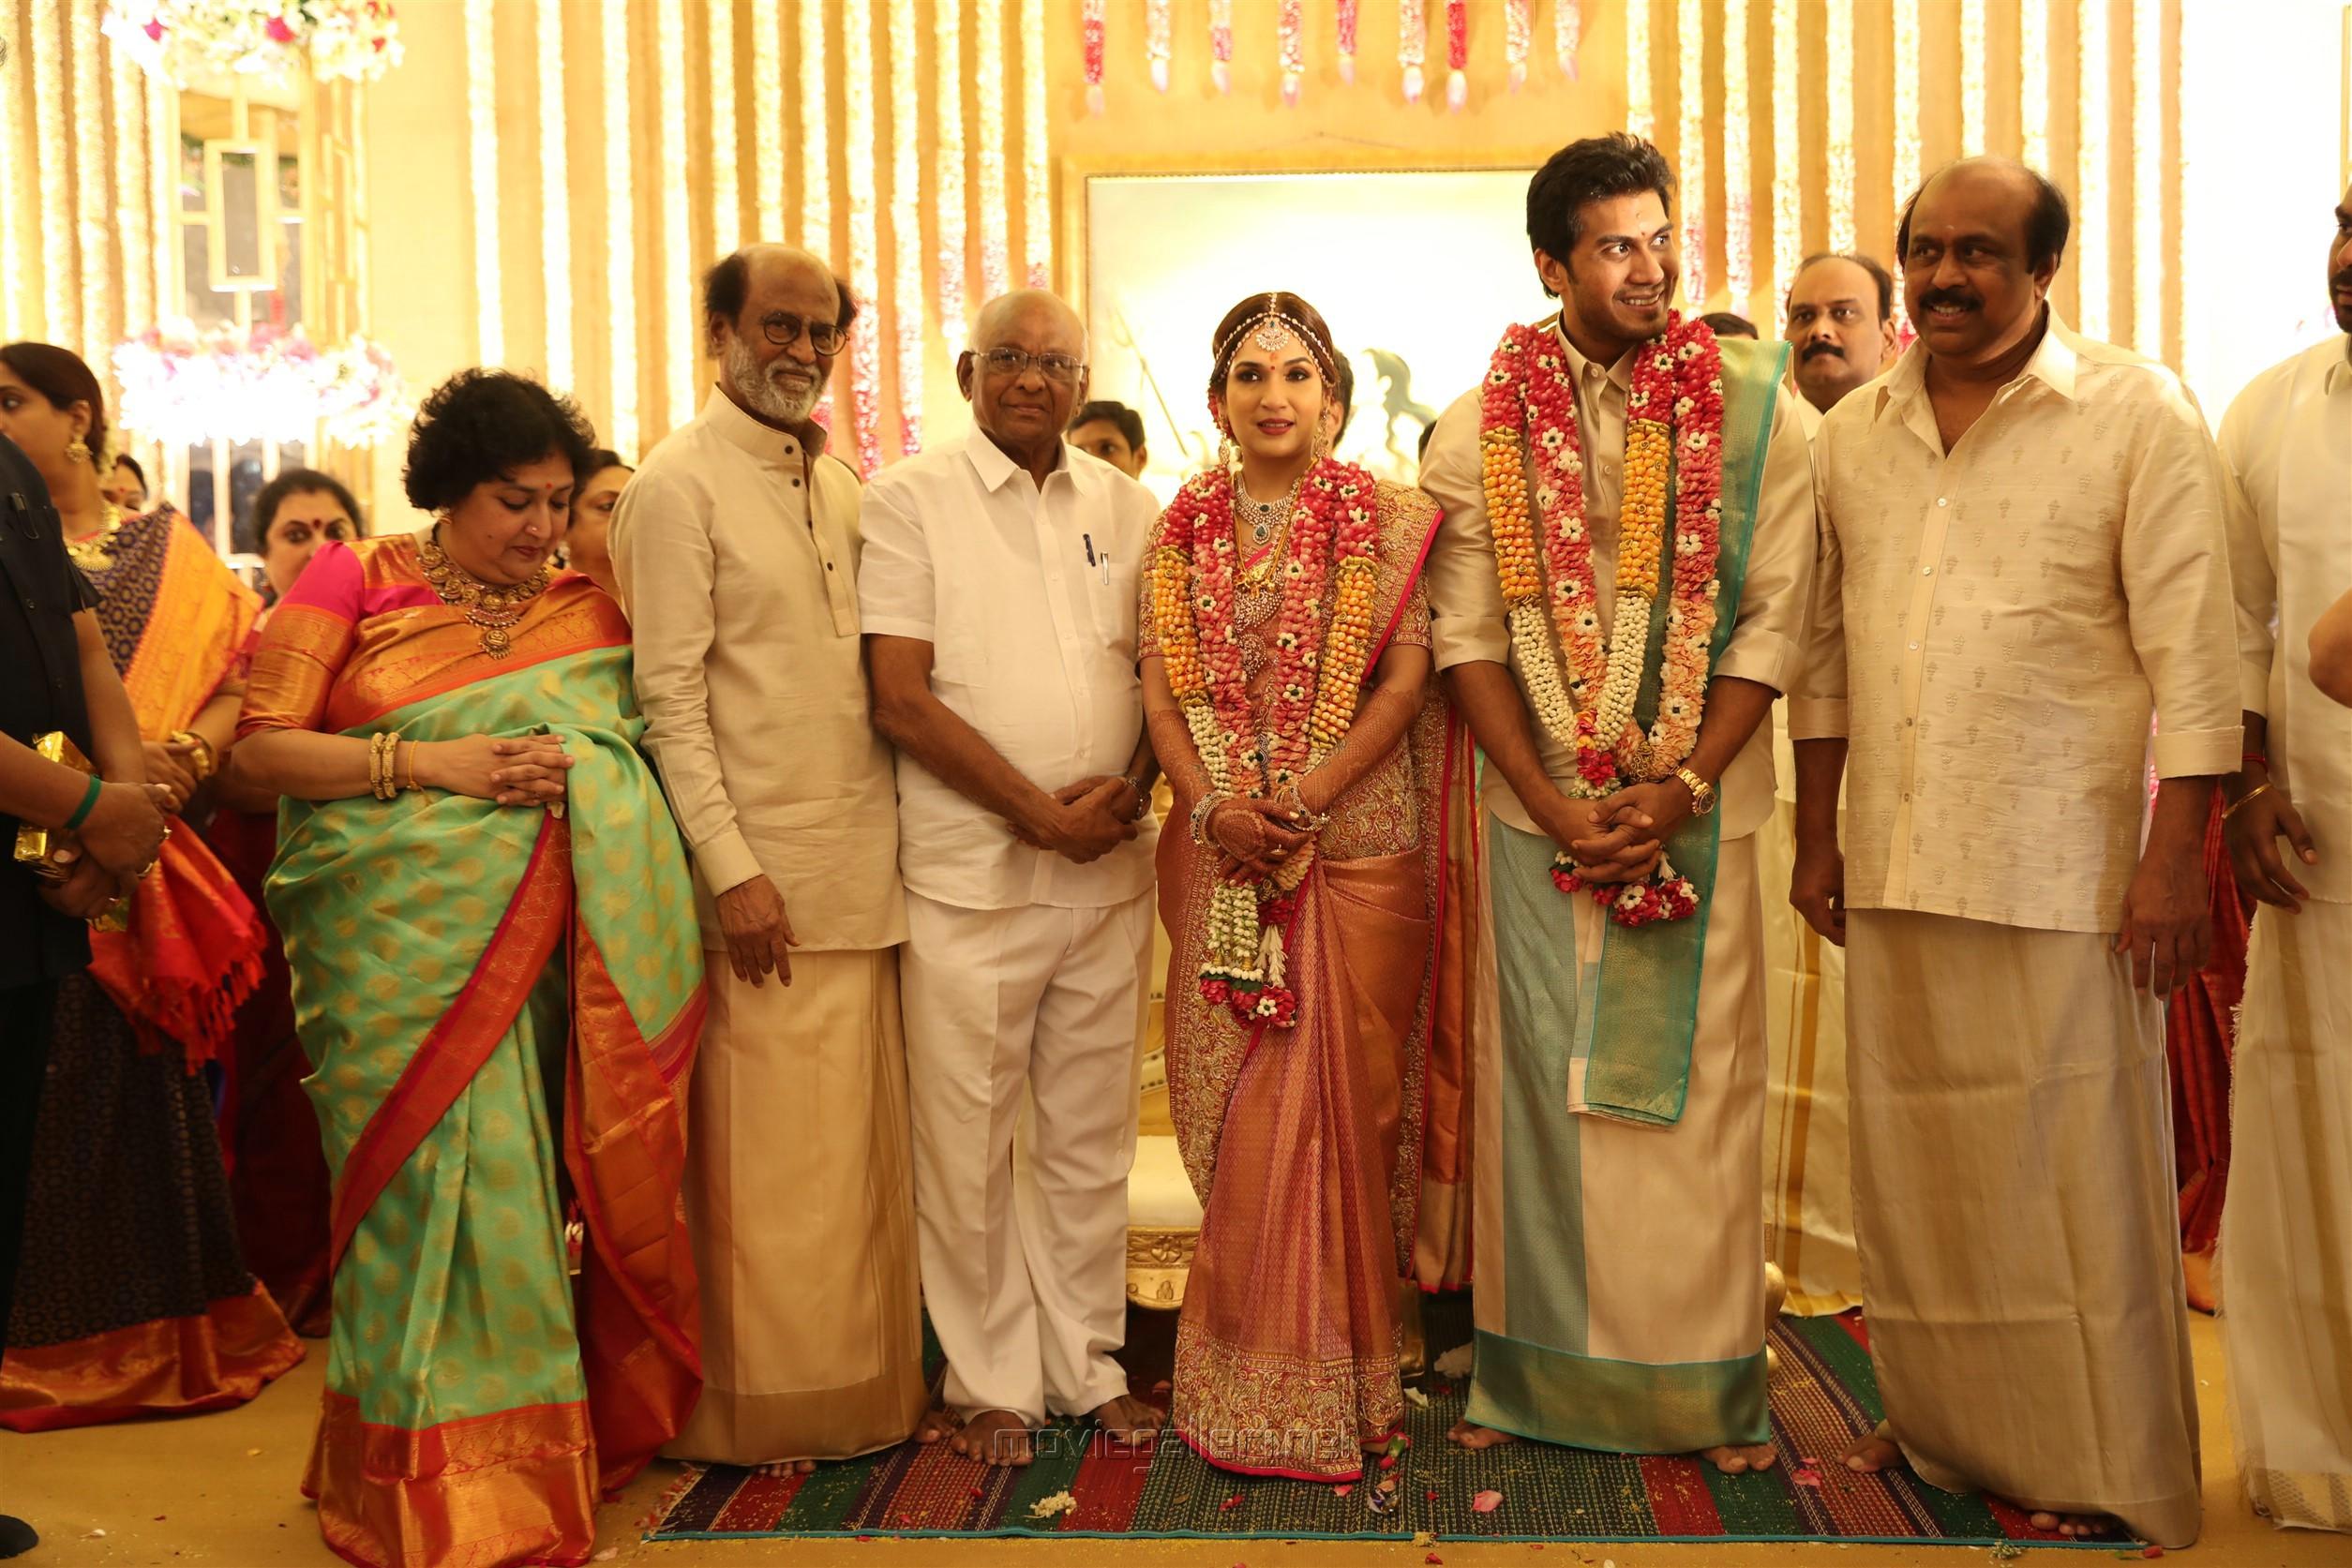 SP MUthuraman @ Vishagan Soundarya Rajinikanth Marriage Photos HD